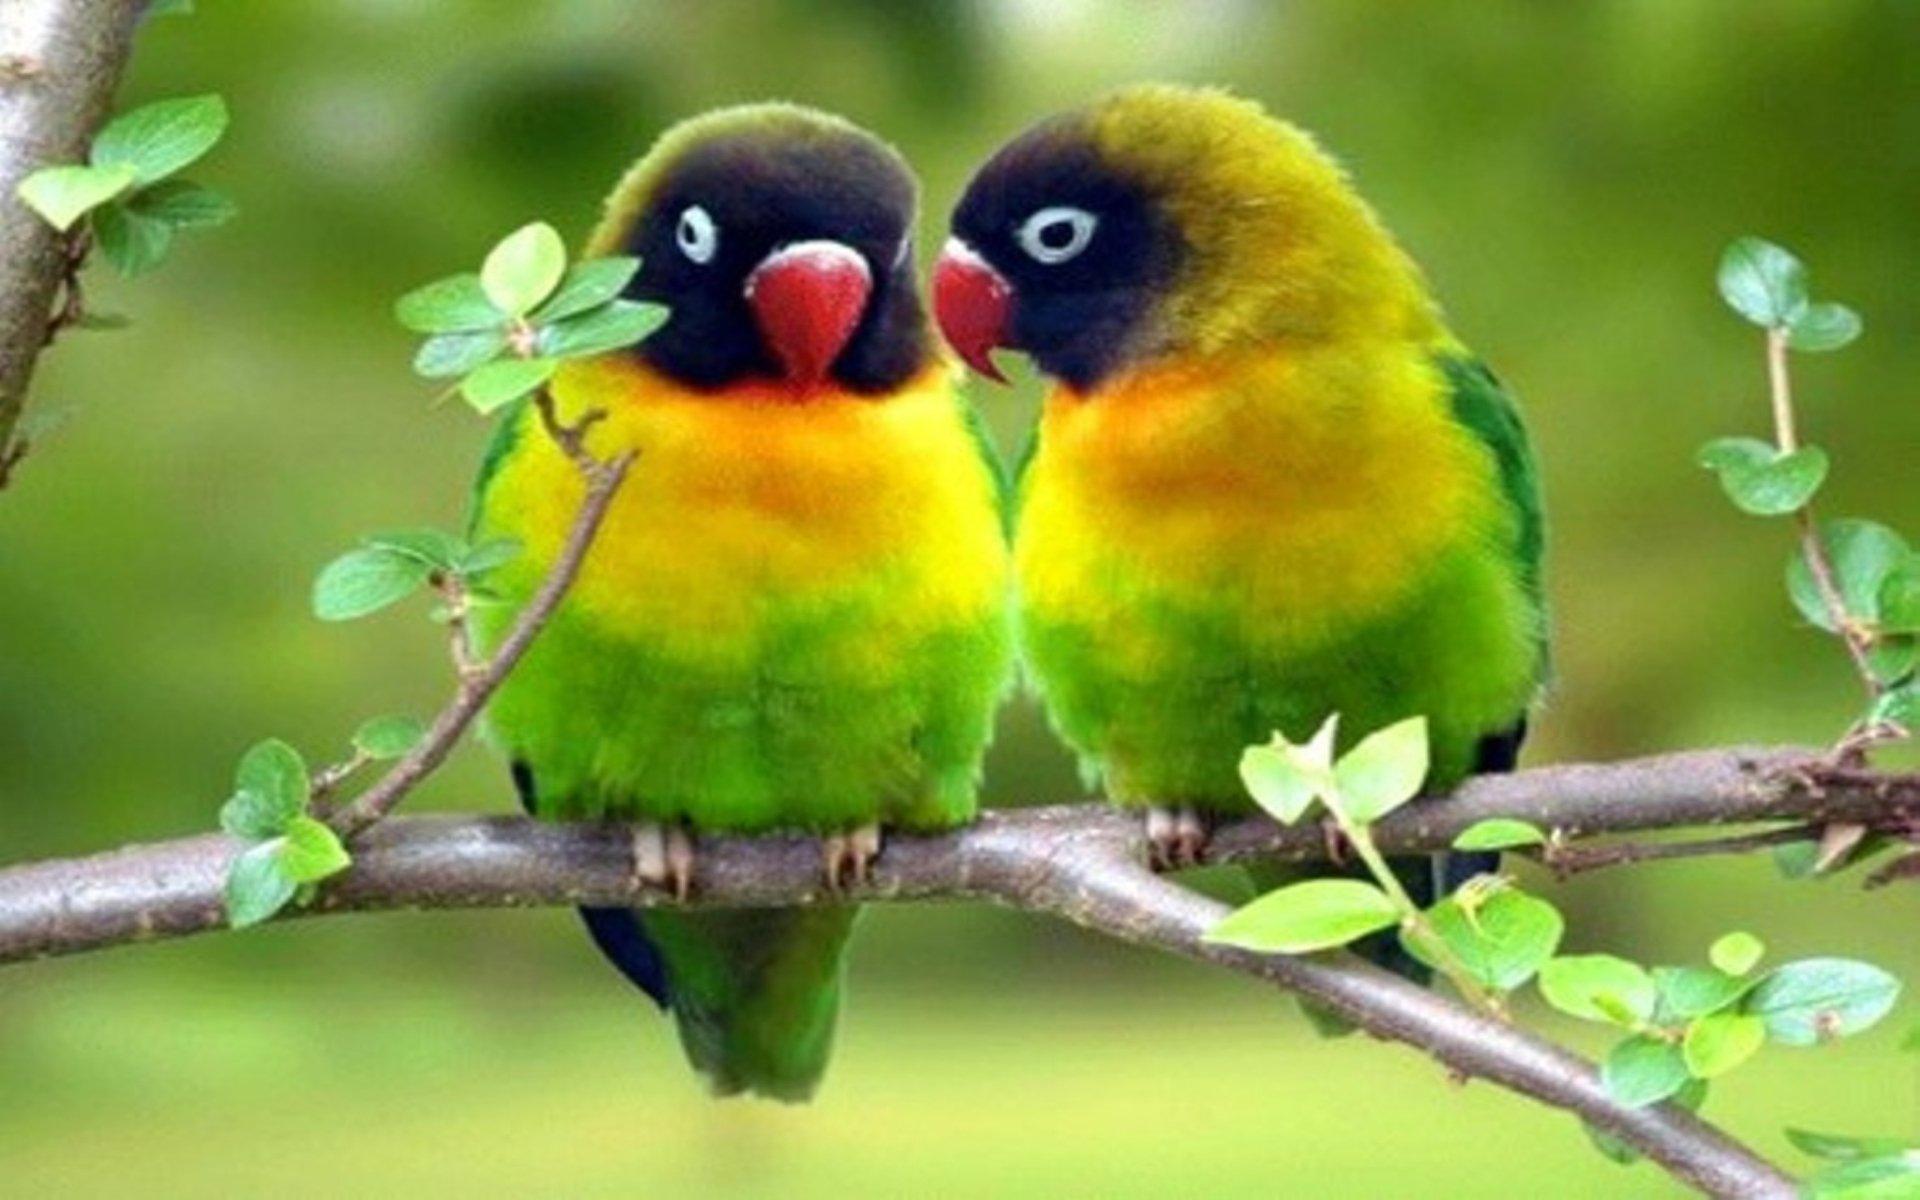 Love Birds Hd Wallpapers: Love Birds S HD Wallpaper